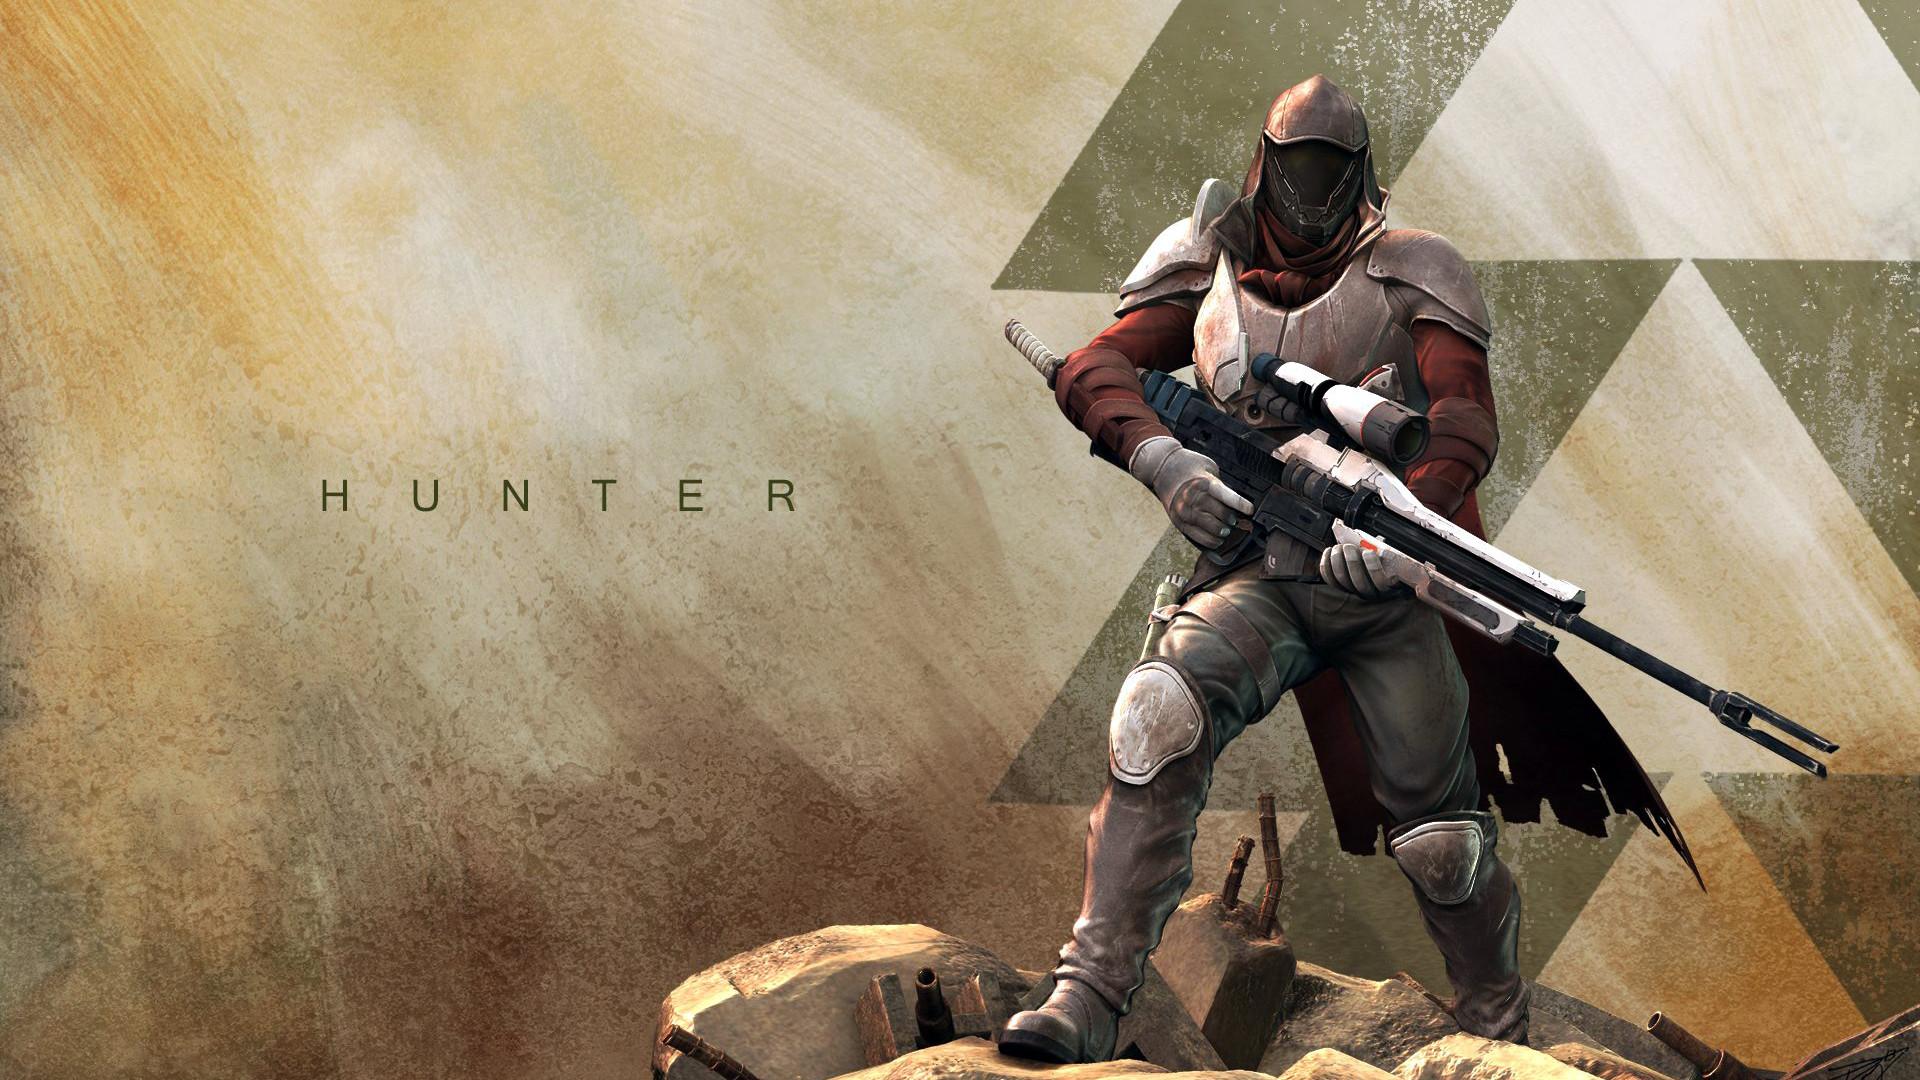 Res: 1920x1080, Destiny Hunter Guardian (2048x1152 Resolution)